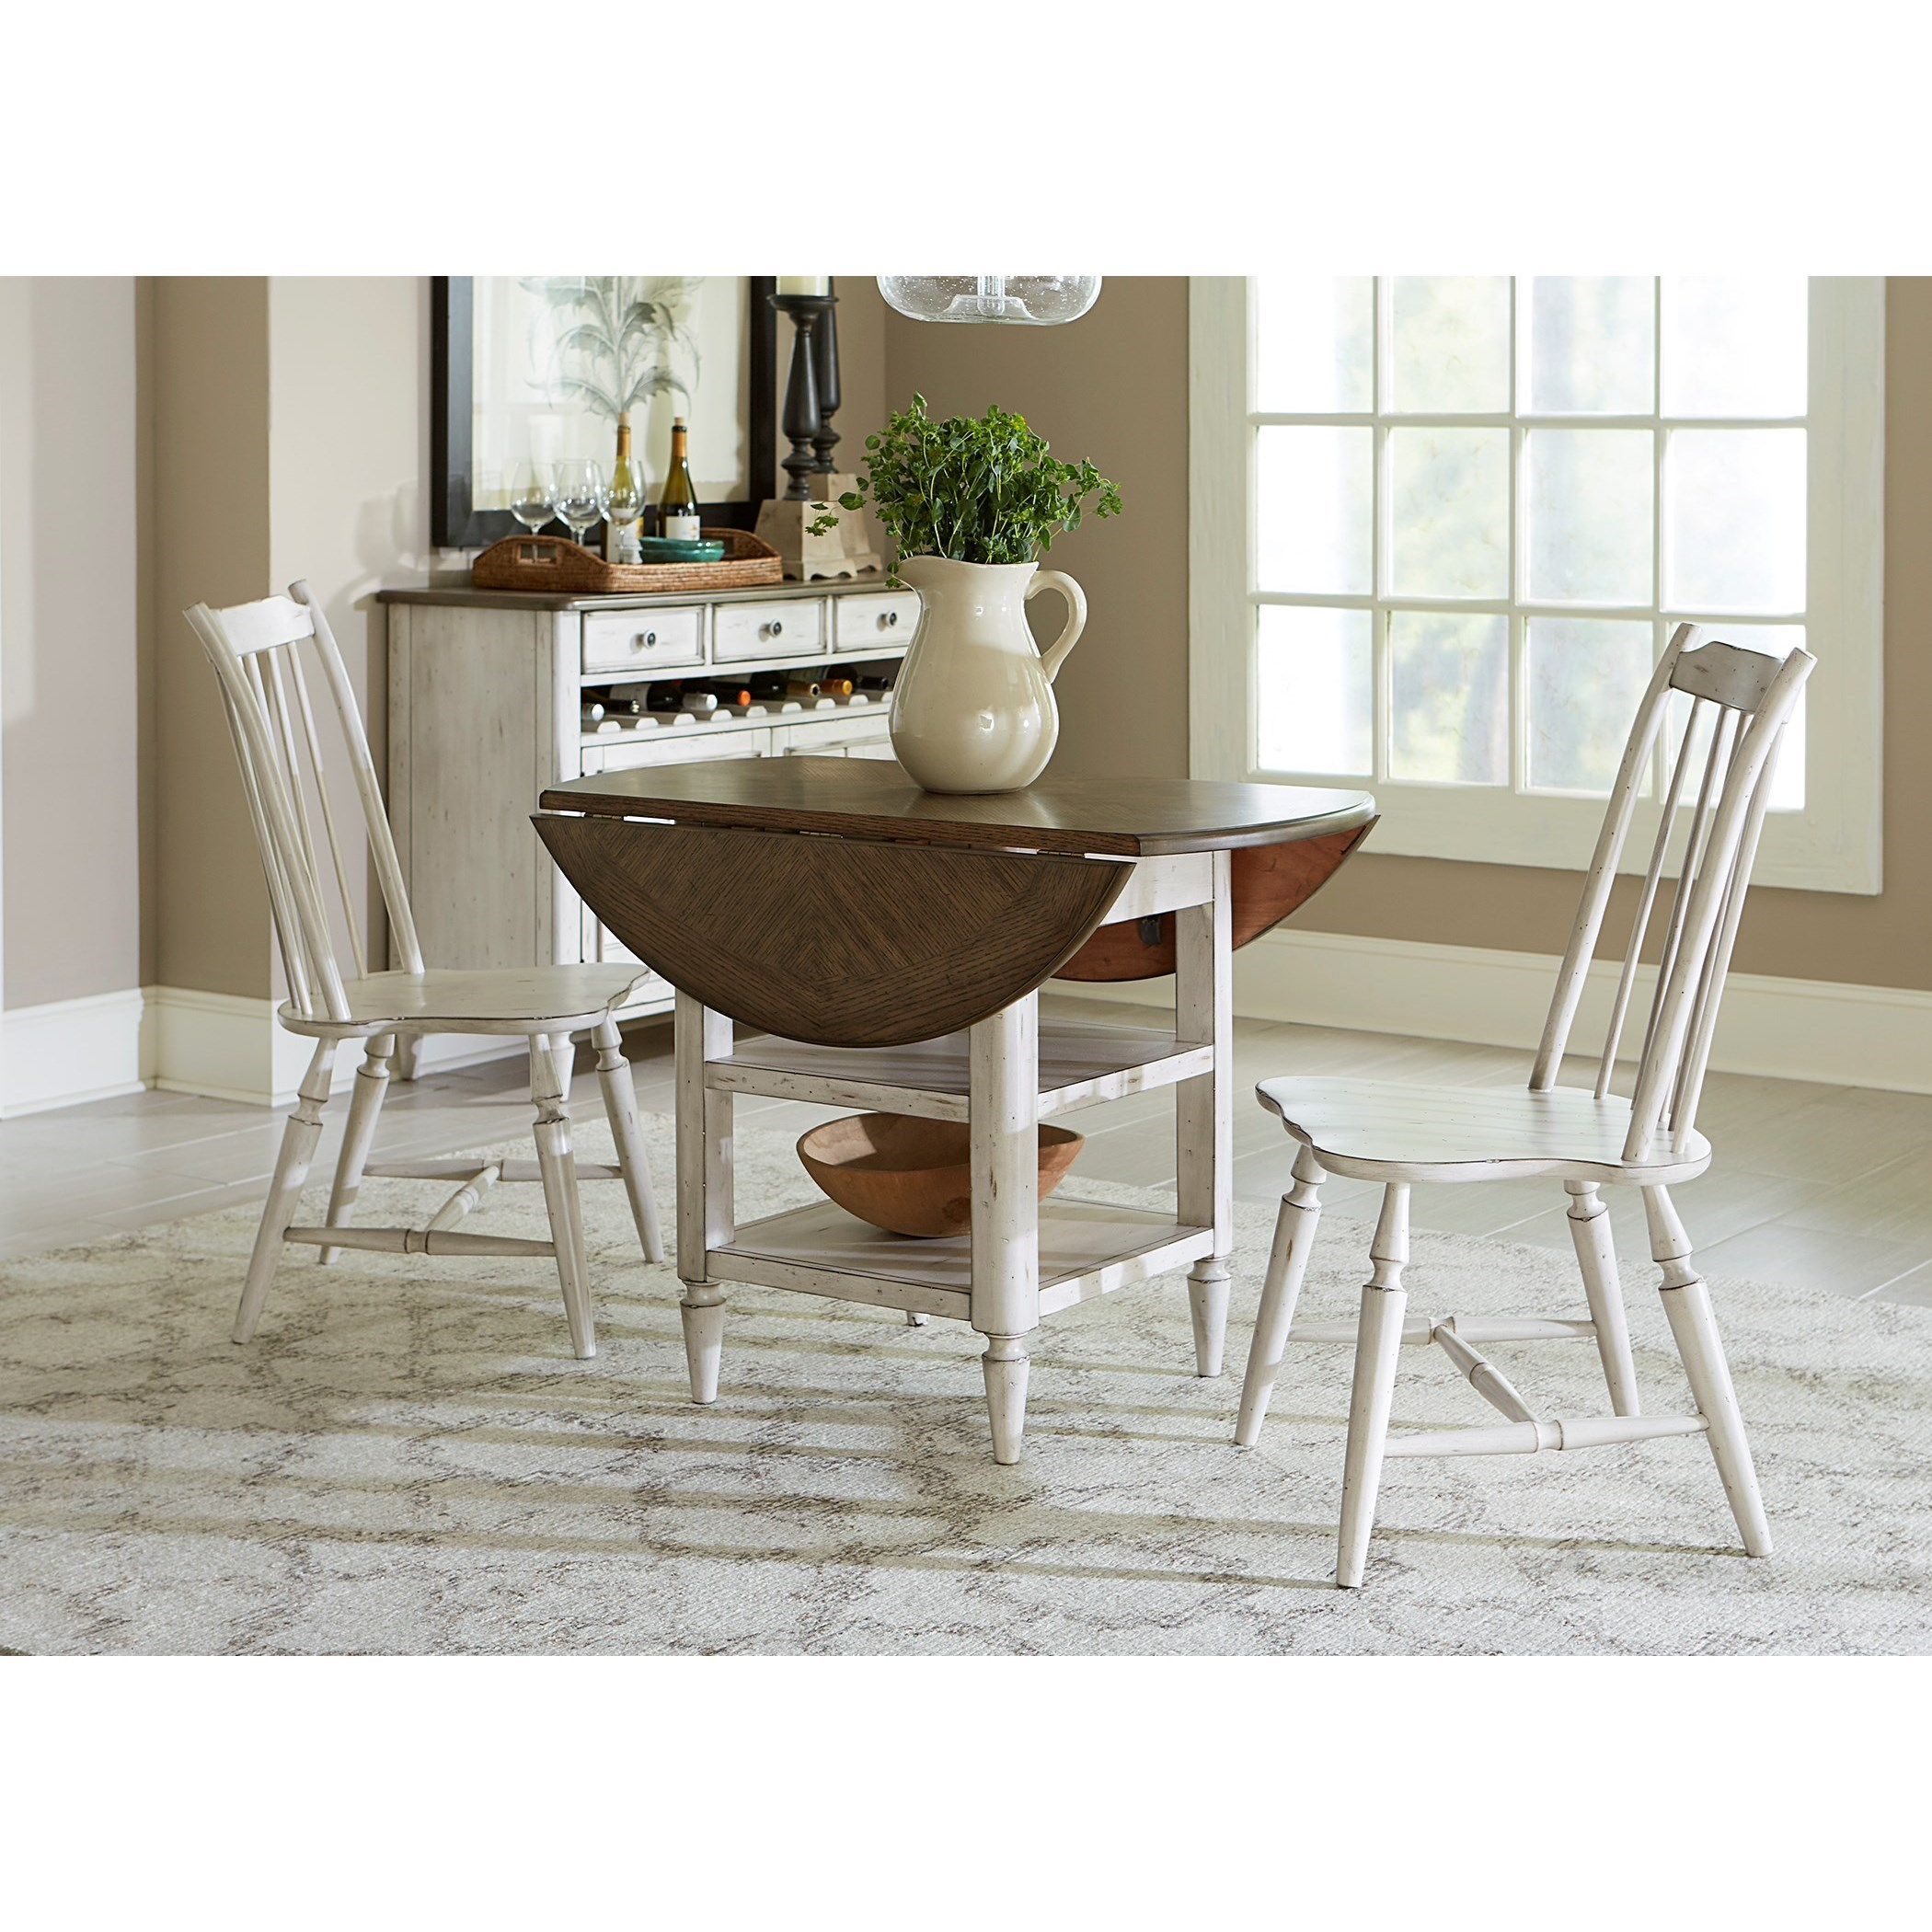 Liberty Furniture Oak Hill Dining 3 Piece Drop Leaf Table Set - Item Number: 517-CD-3DLS